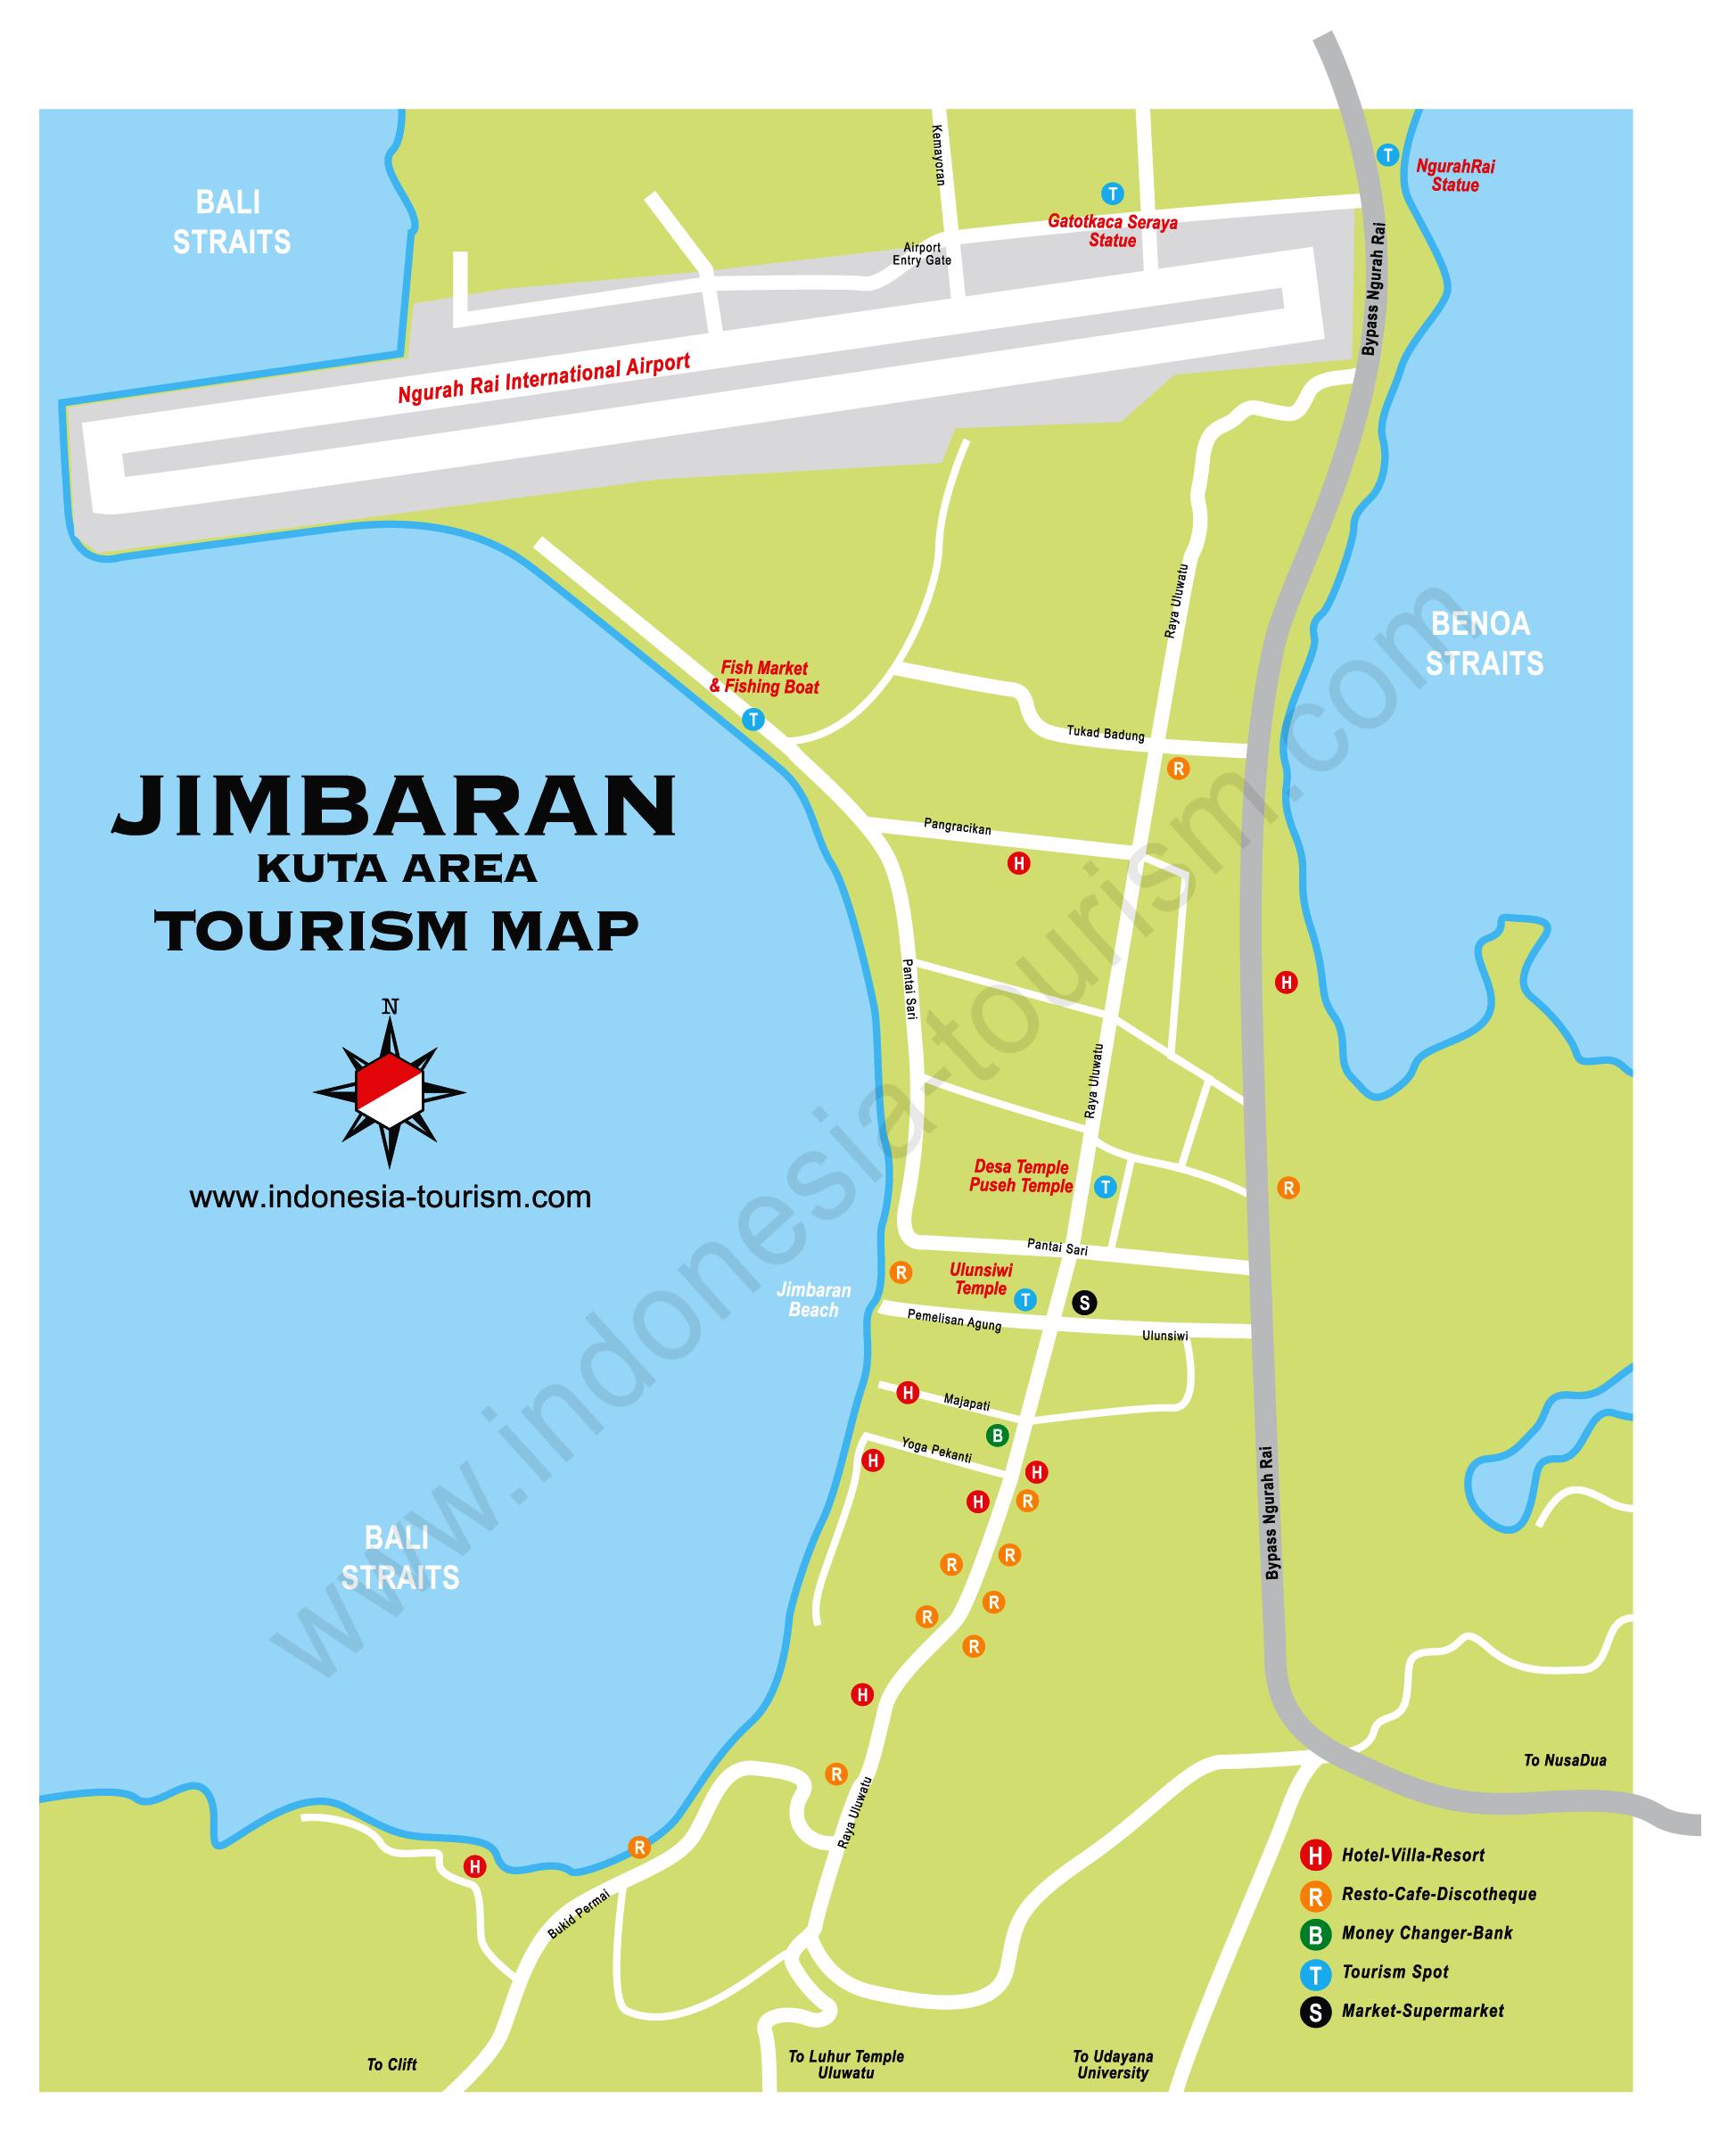 Jimbaran Bali Map - Bali Island , Indonesia Tourism Maps